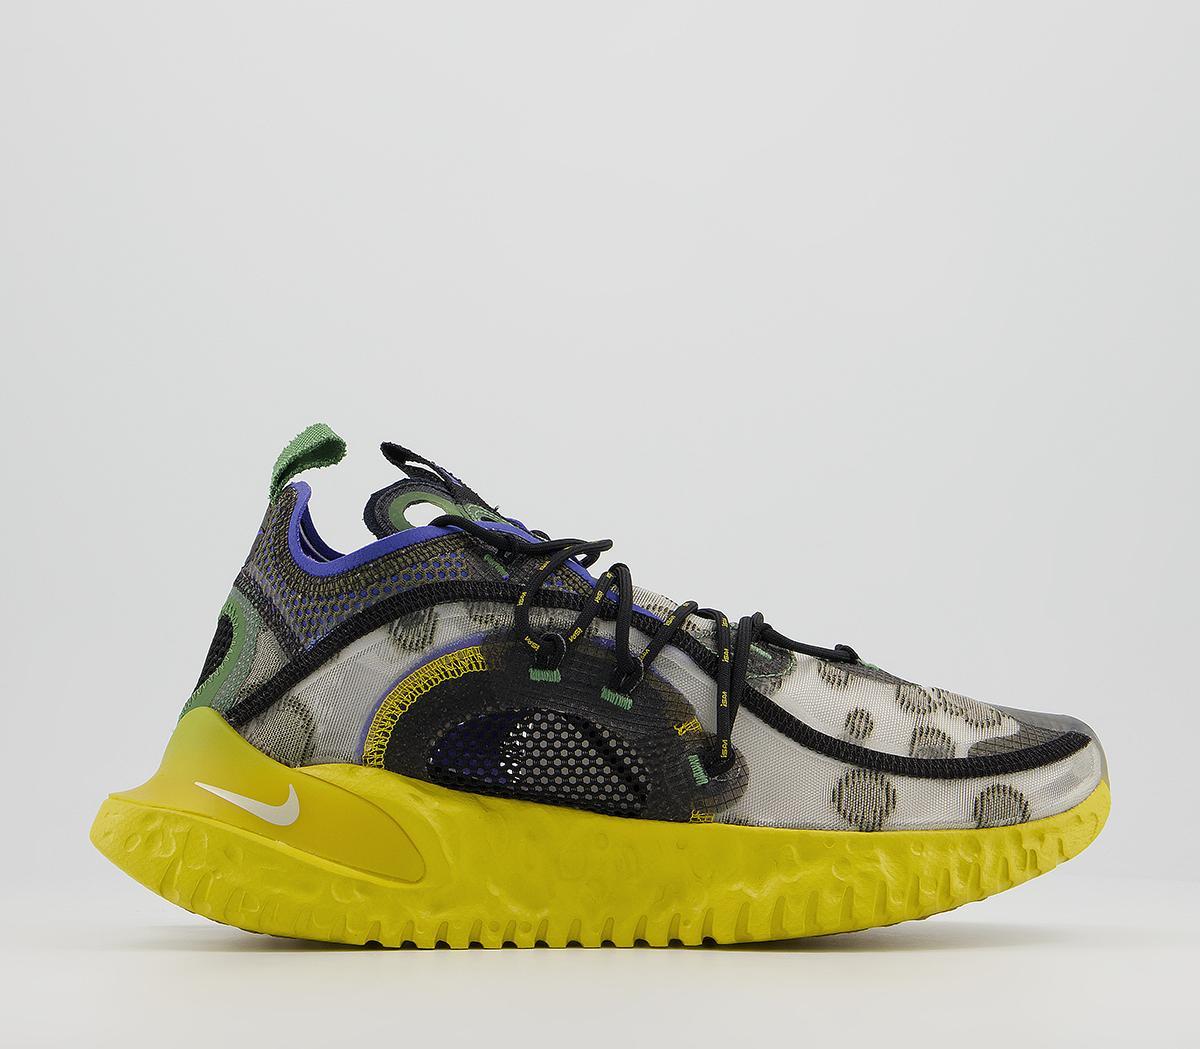 Nike Flow 2020 Ispa Trainers